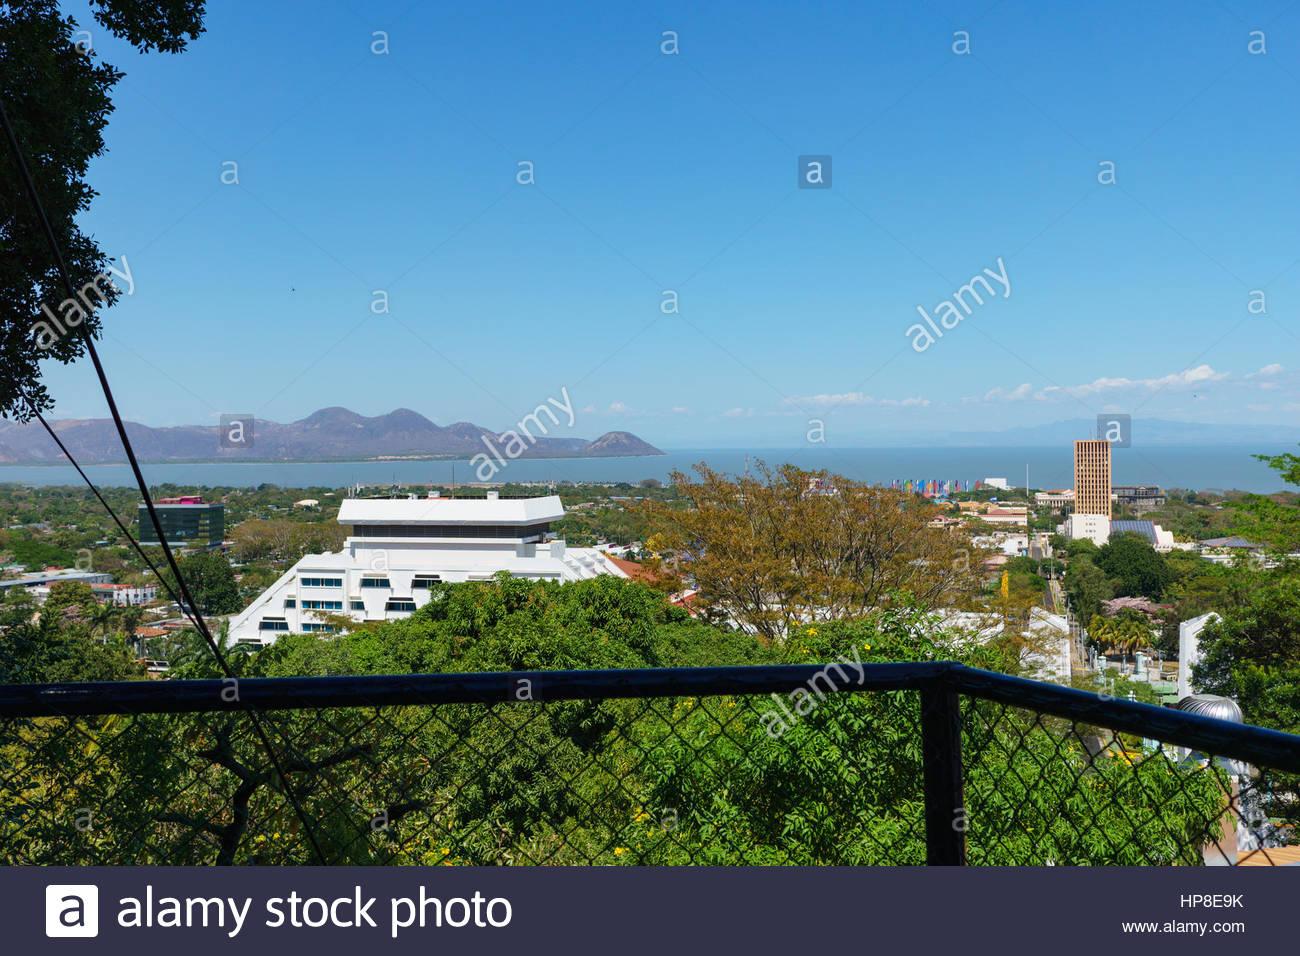 managua-skyline-with-the-crowne-plaza-ho